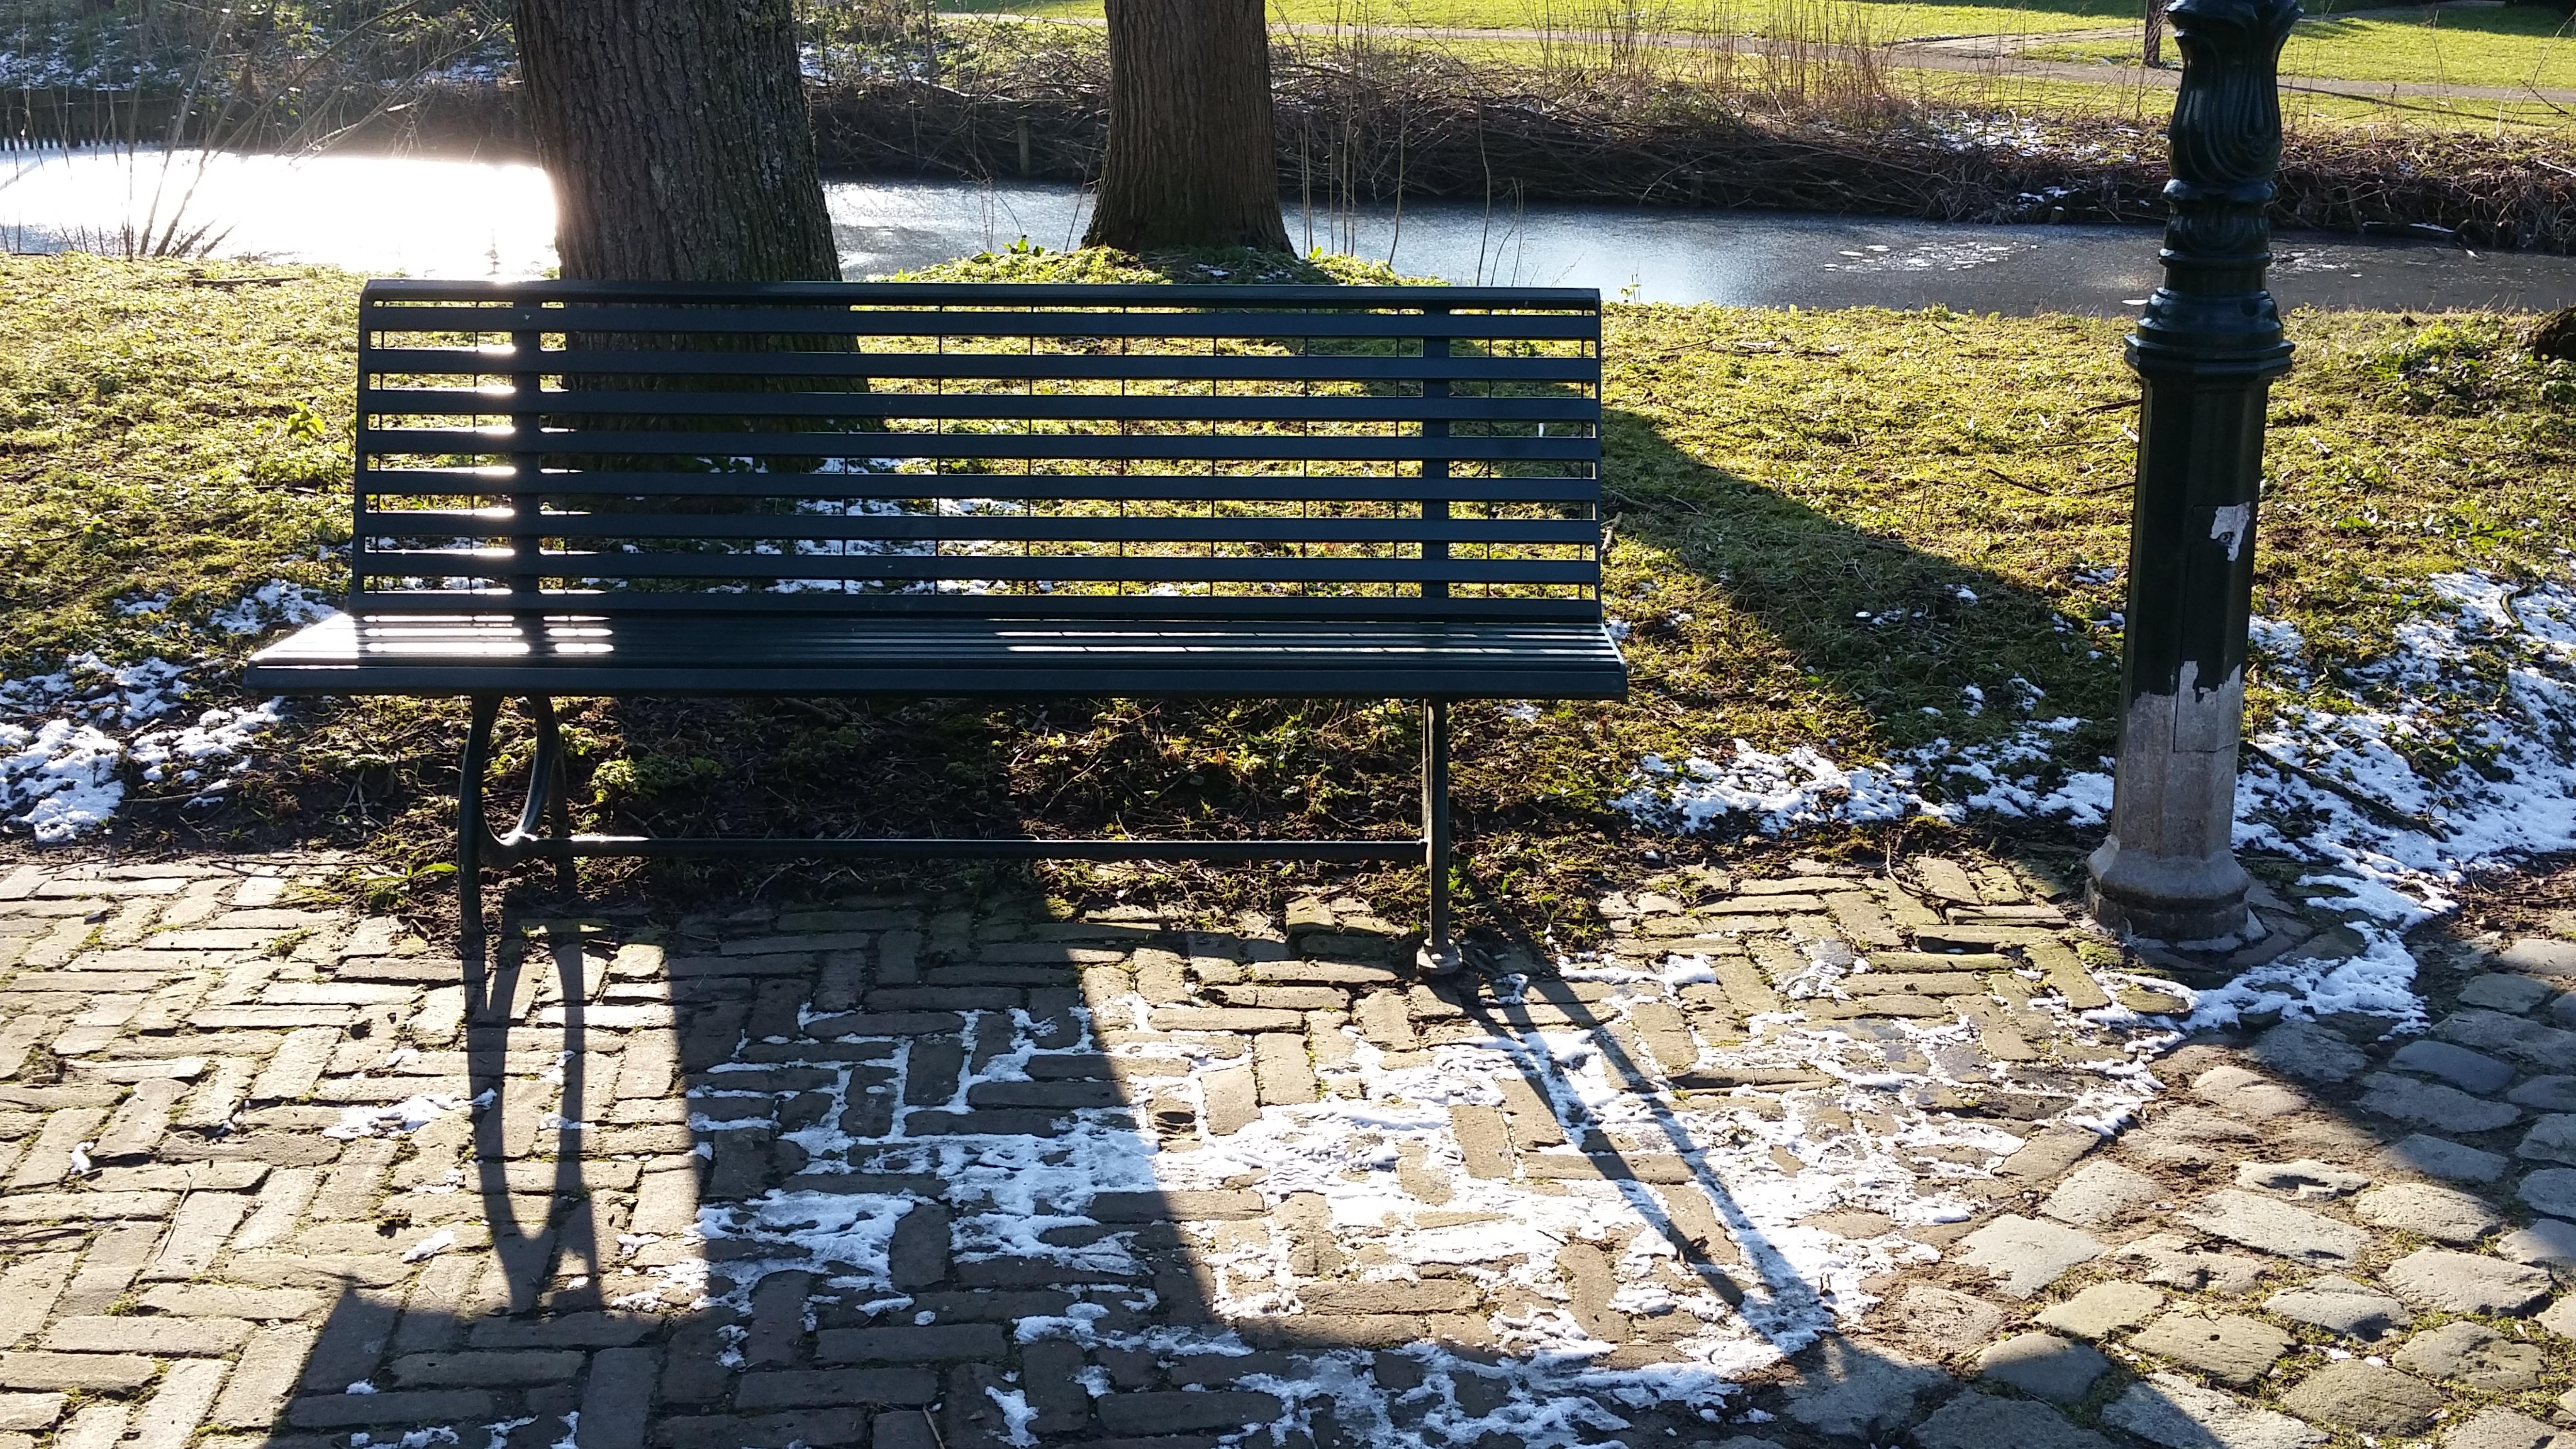 Fotos gratis : nieve, madera, banco, Pasarela, parque, patio ...